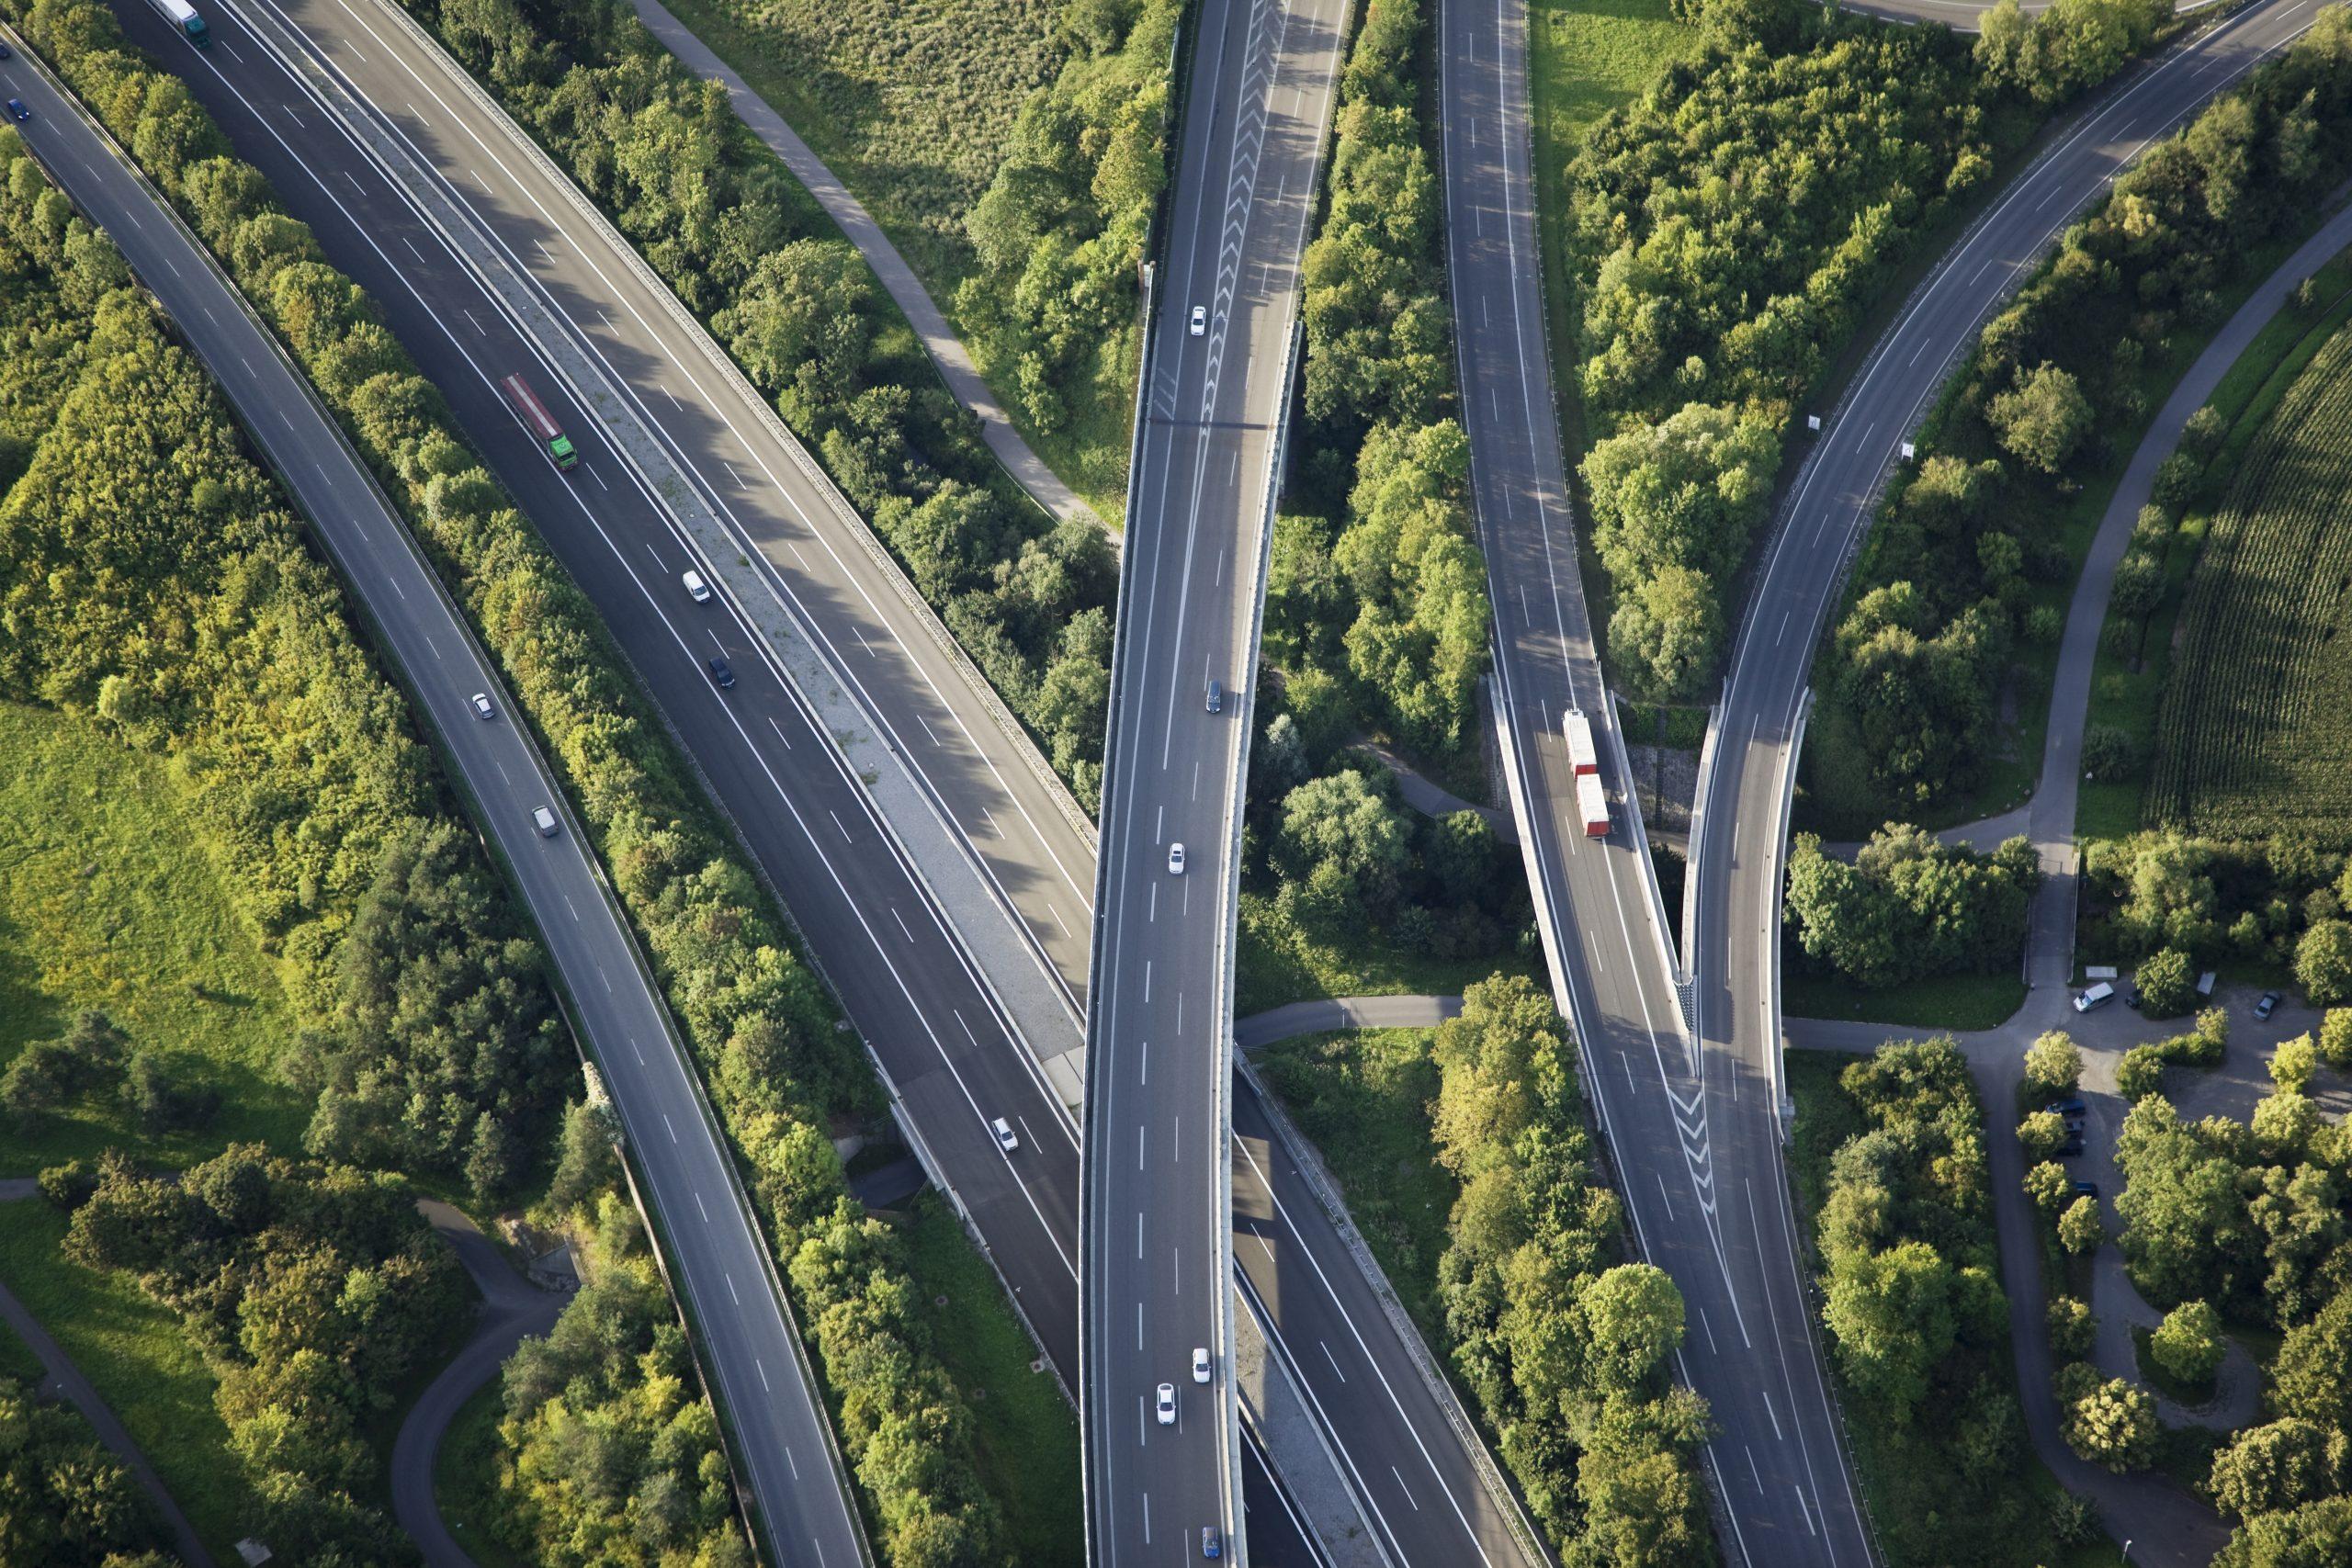 [url=http://www.istockphoto.com/my_lightbox_contents.php?lightboxID=856990 t=_blank][img]http://www1.istockphoto.com/generic_image_view/26784/26784[/img][/url] Aerial view of highways through green nature Light grain because of 320 ASA